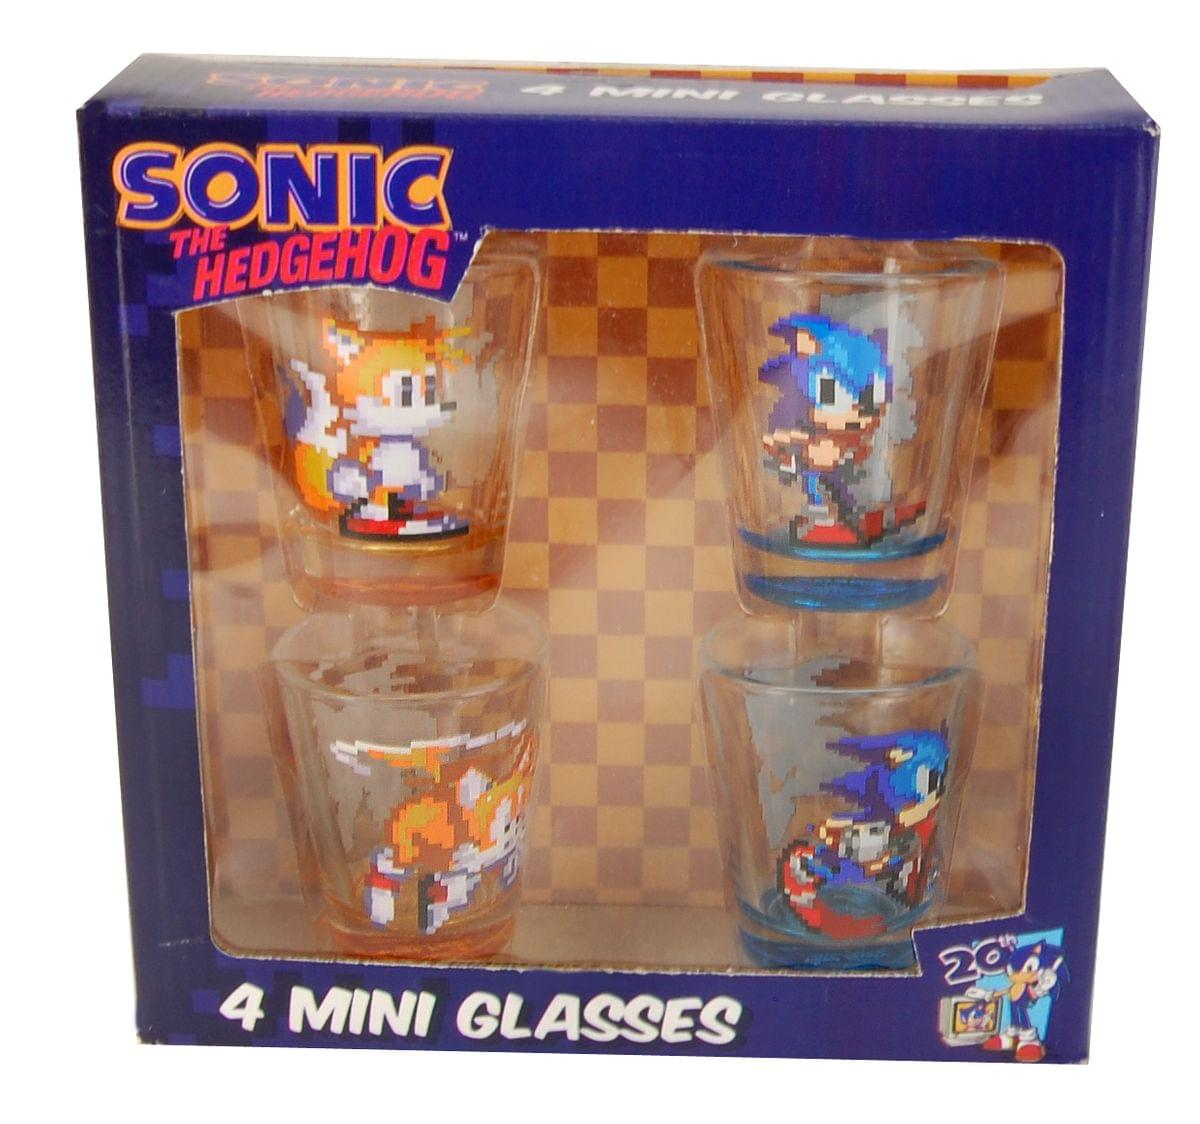 Sonic The Hedgehog Shot Glass Set of 4